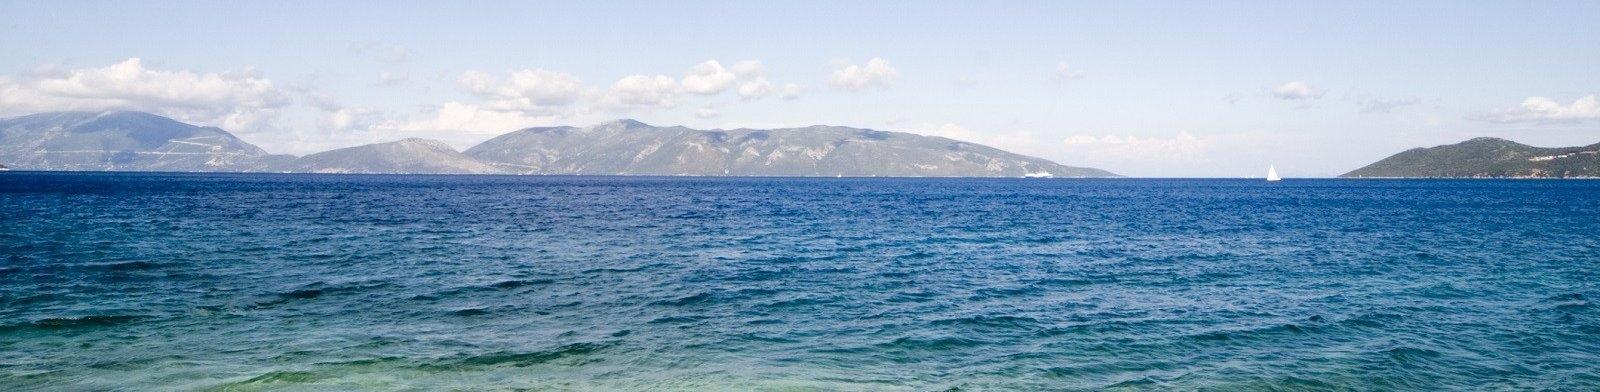 Sami seascape